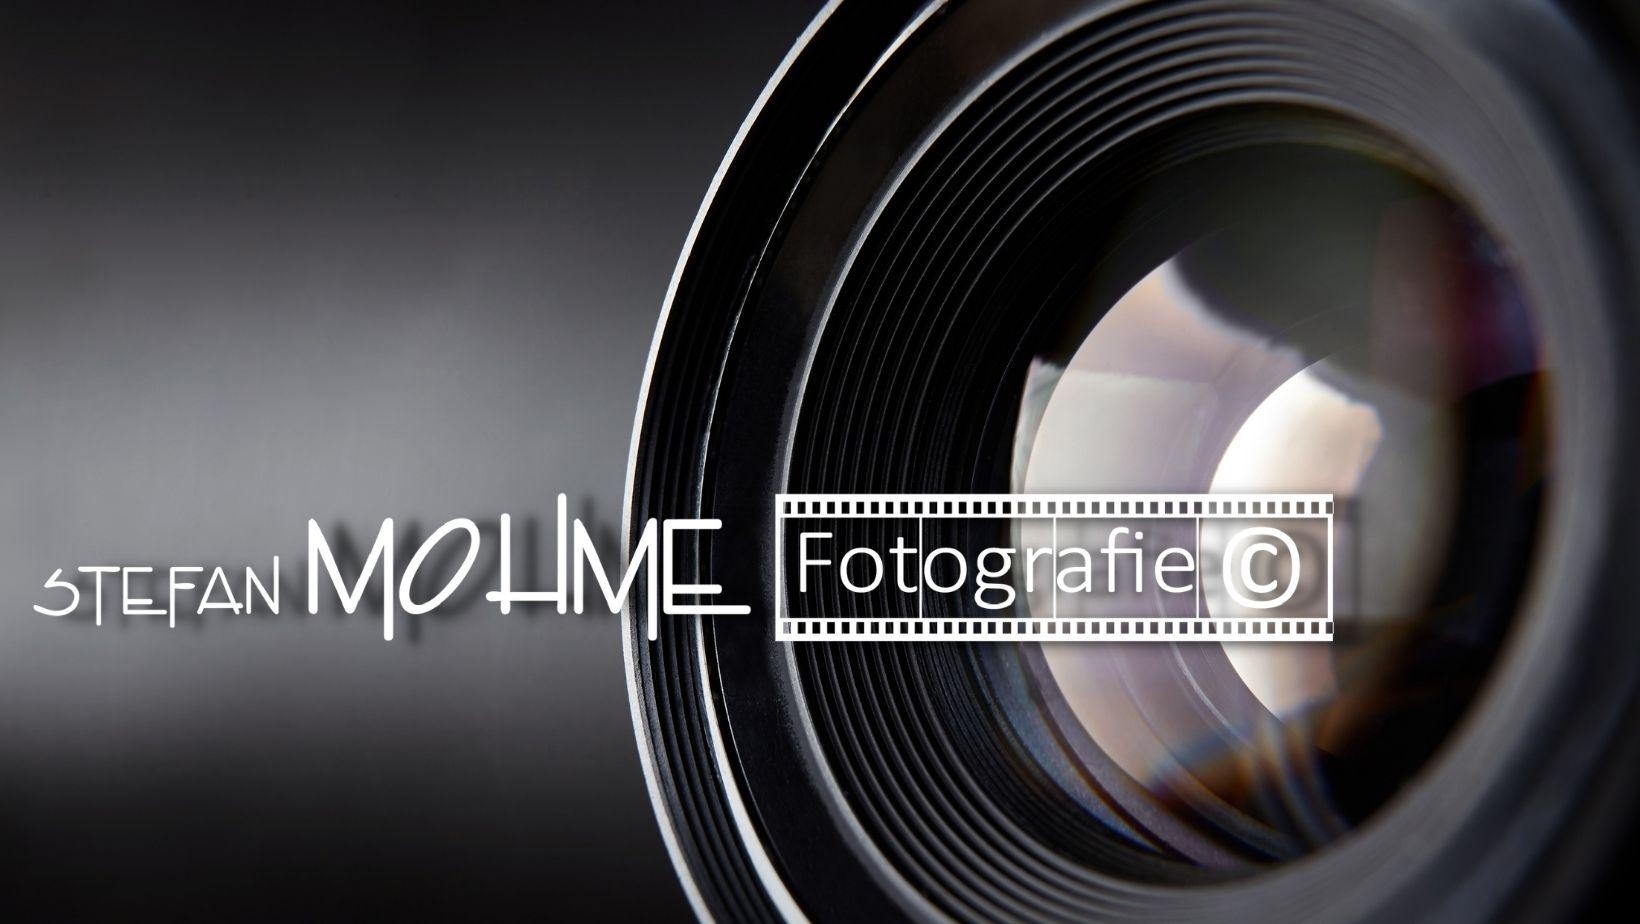 Stefan Mohme Fotografie, Banner,Grafik